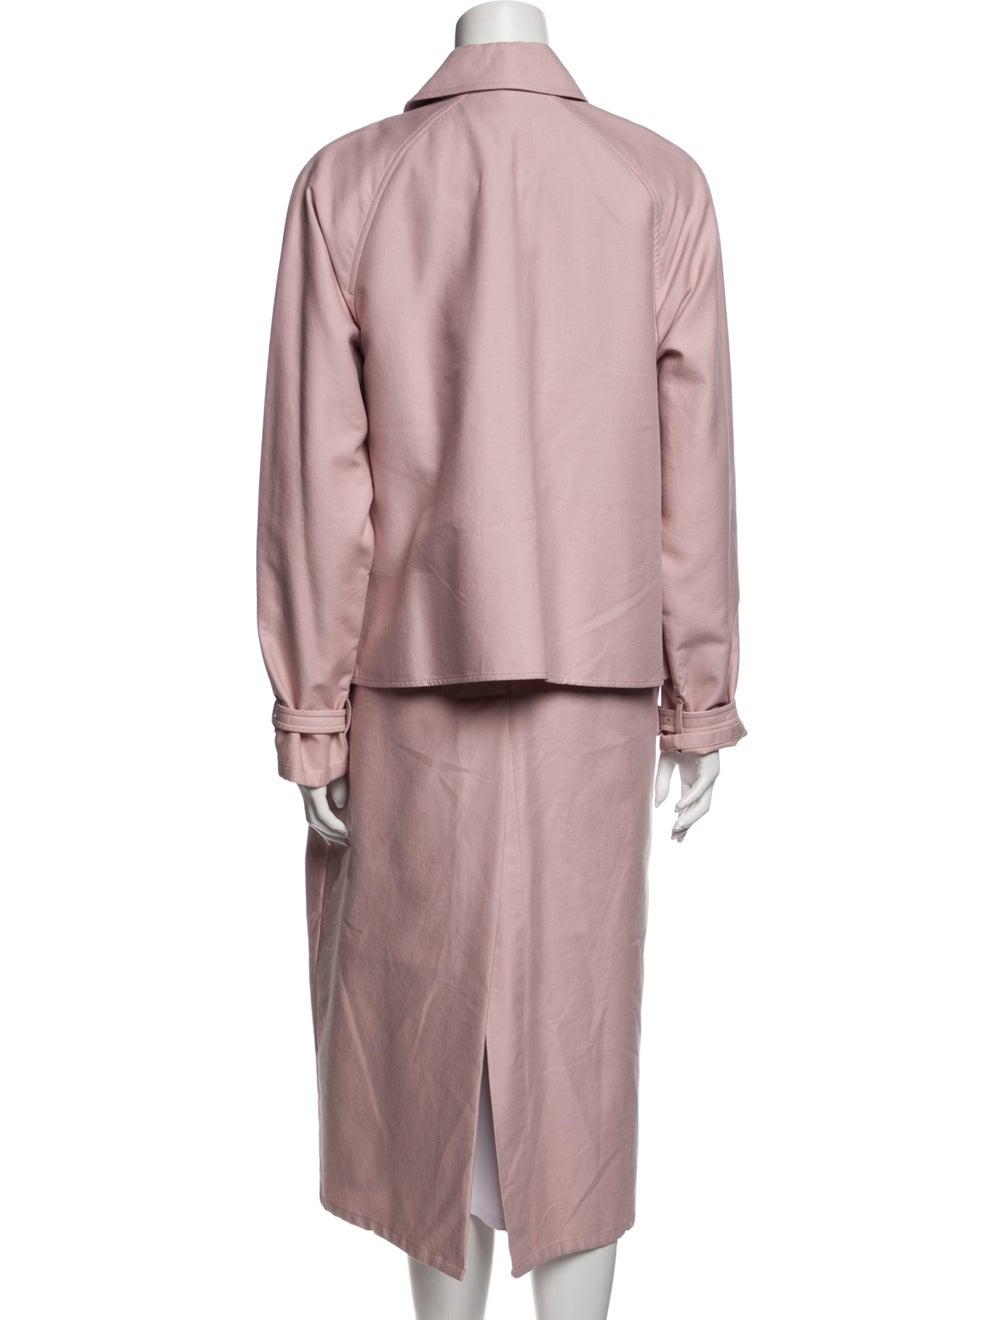 Tibi Trench Coat Pink - image 3